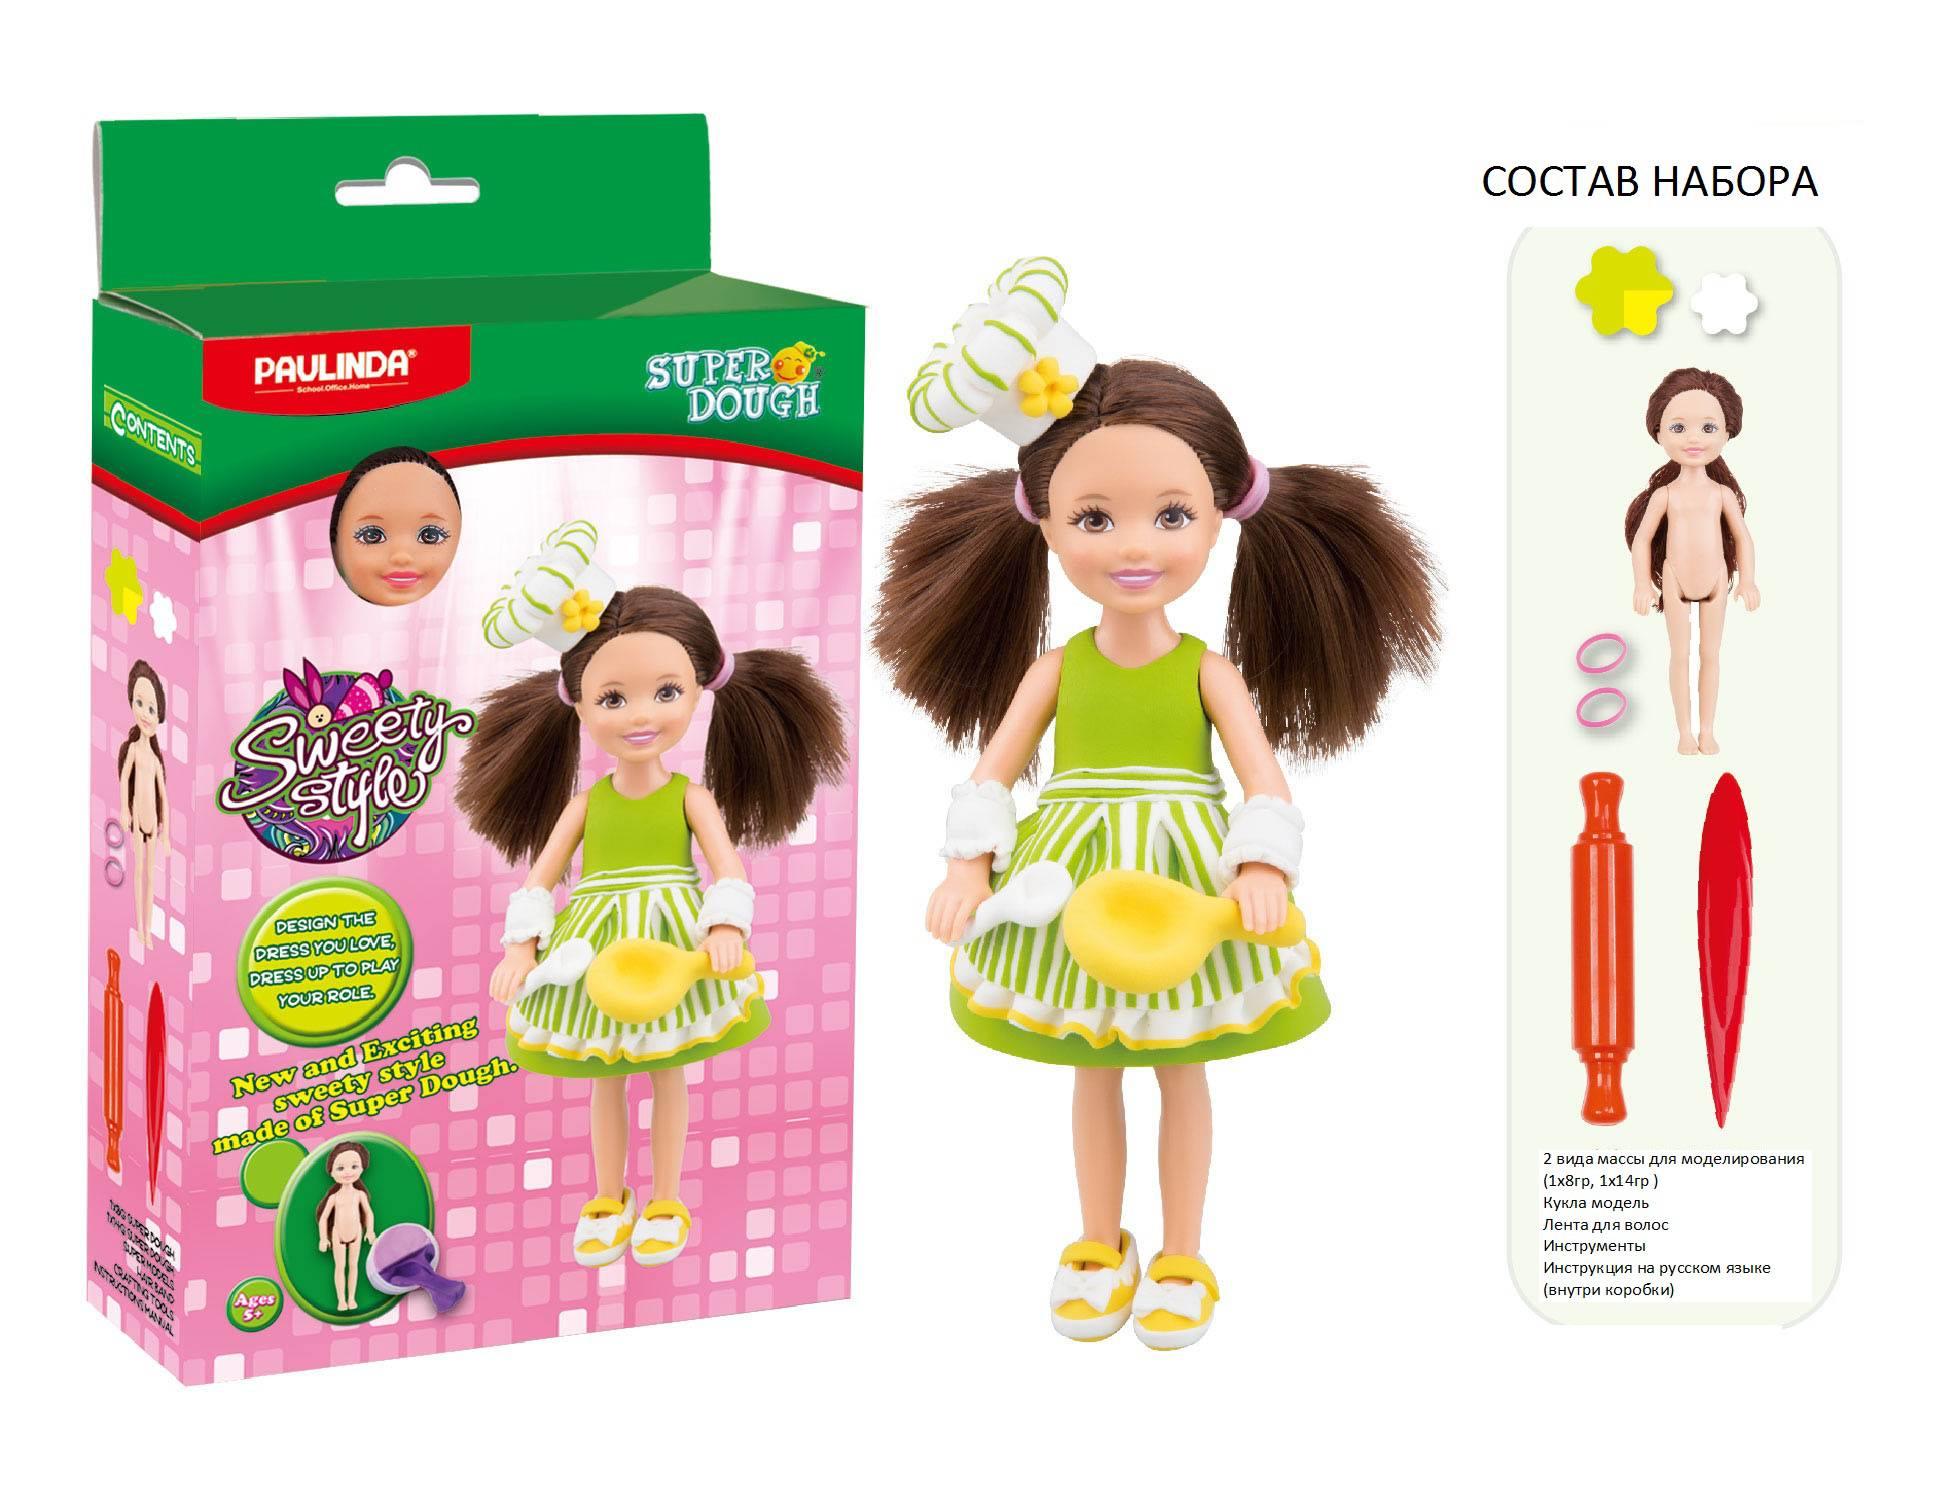 Масса для лепки Sweety Style – Набор для создания наряда для куклы, поварНаборы для лепки<br>Масса для лепки Sweety Style – Набор для создания наряда для куклы, повар<br>